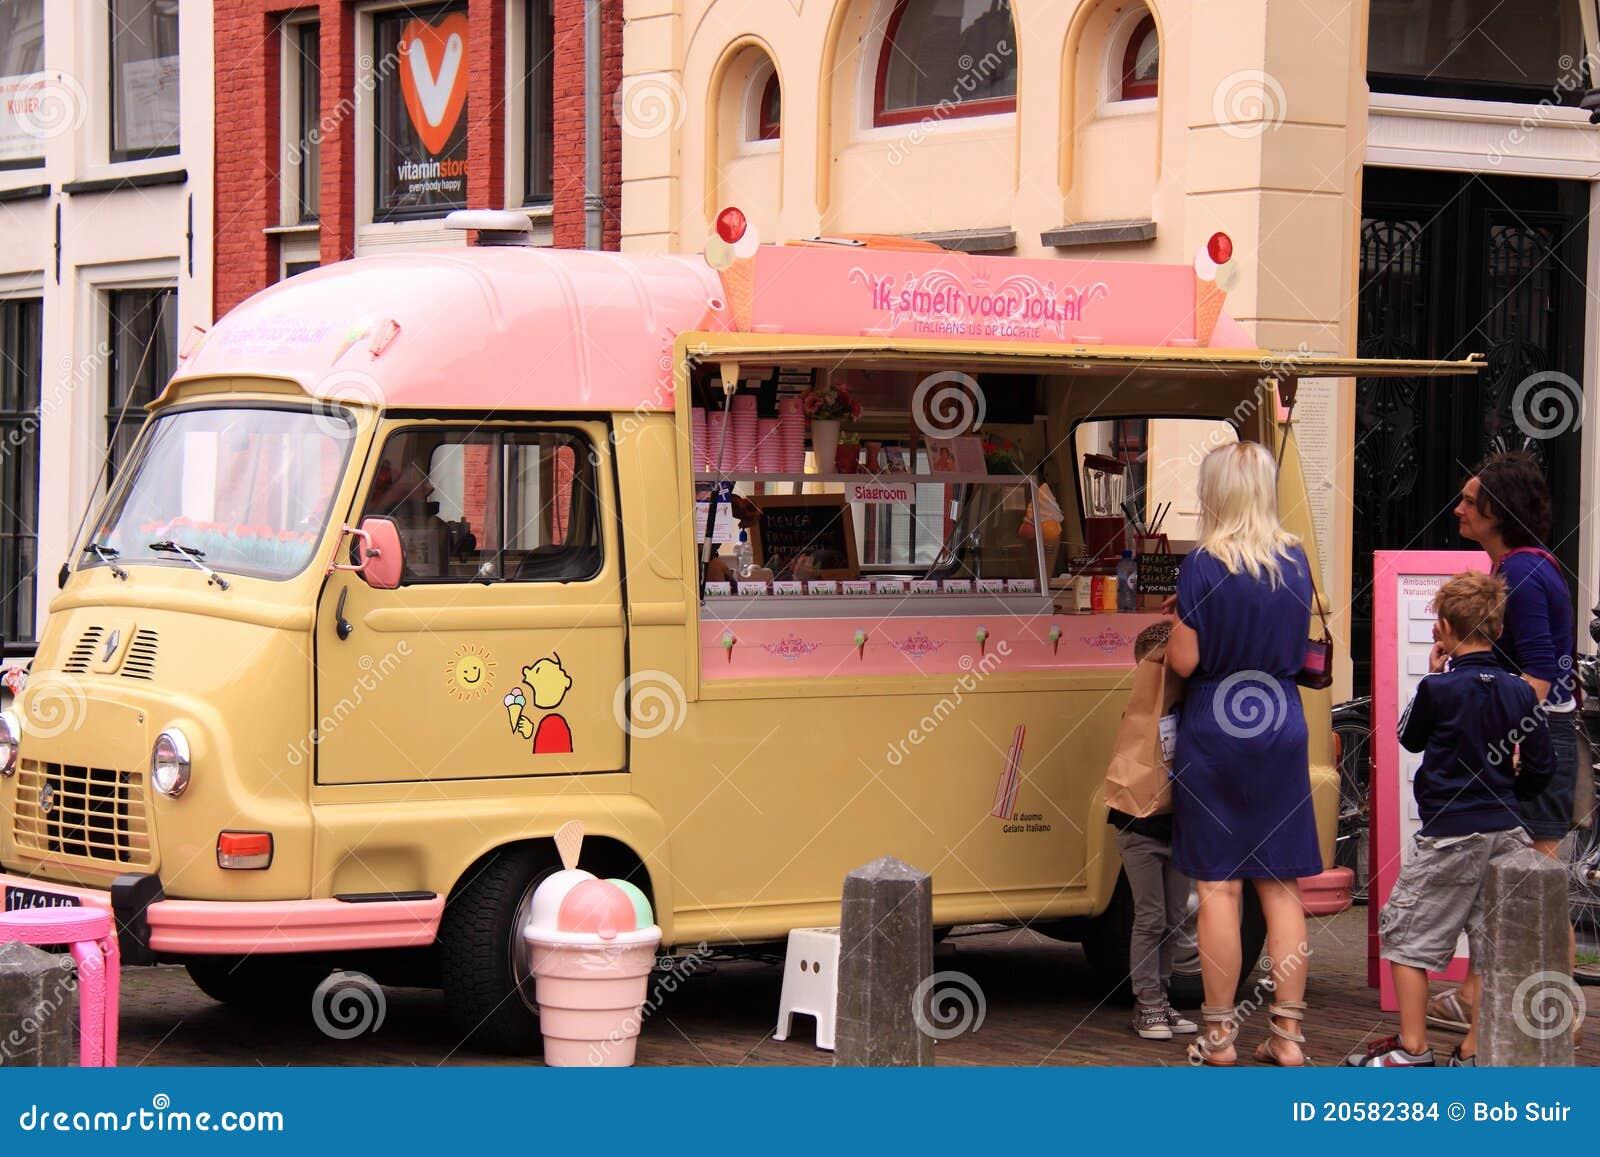 Walls old fashioned ice cream 73